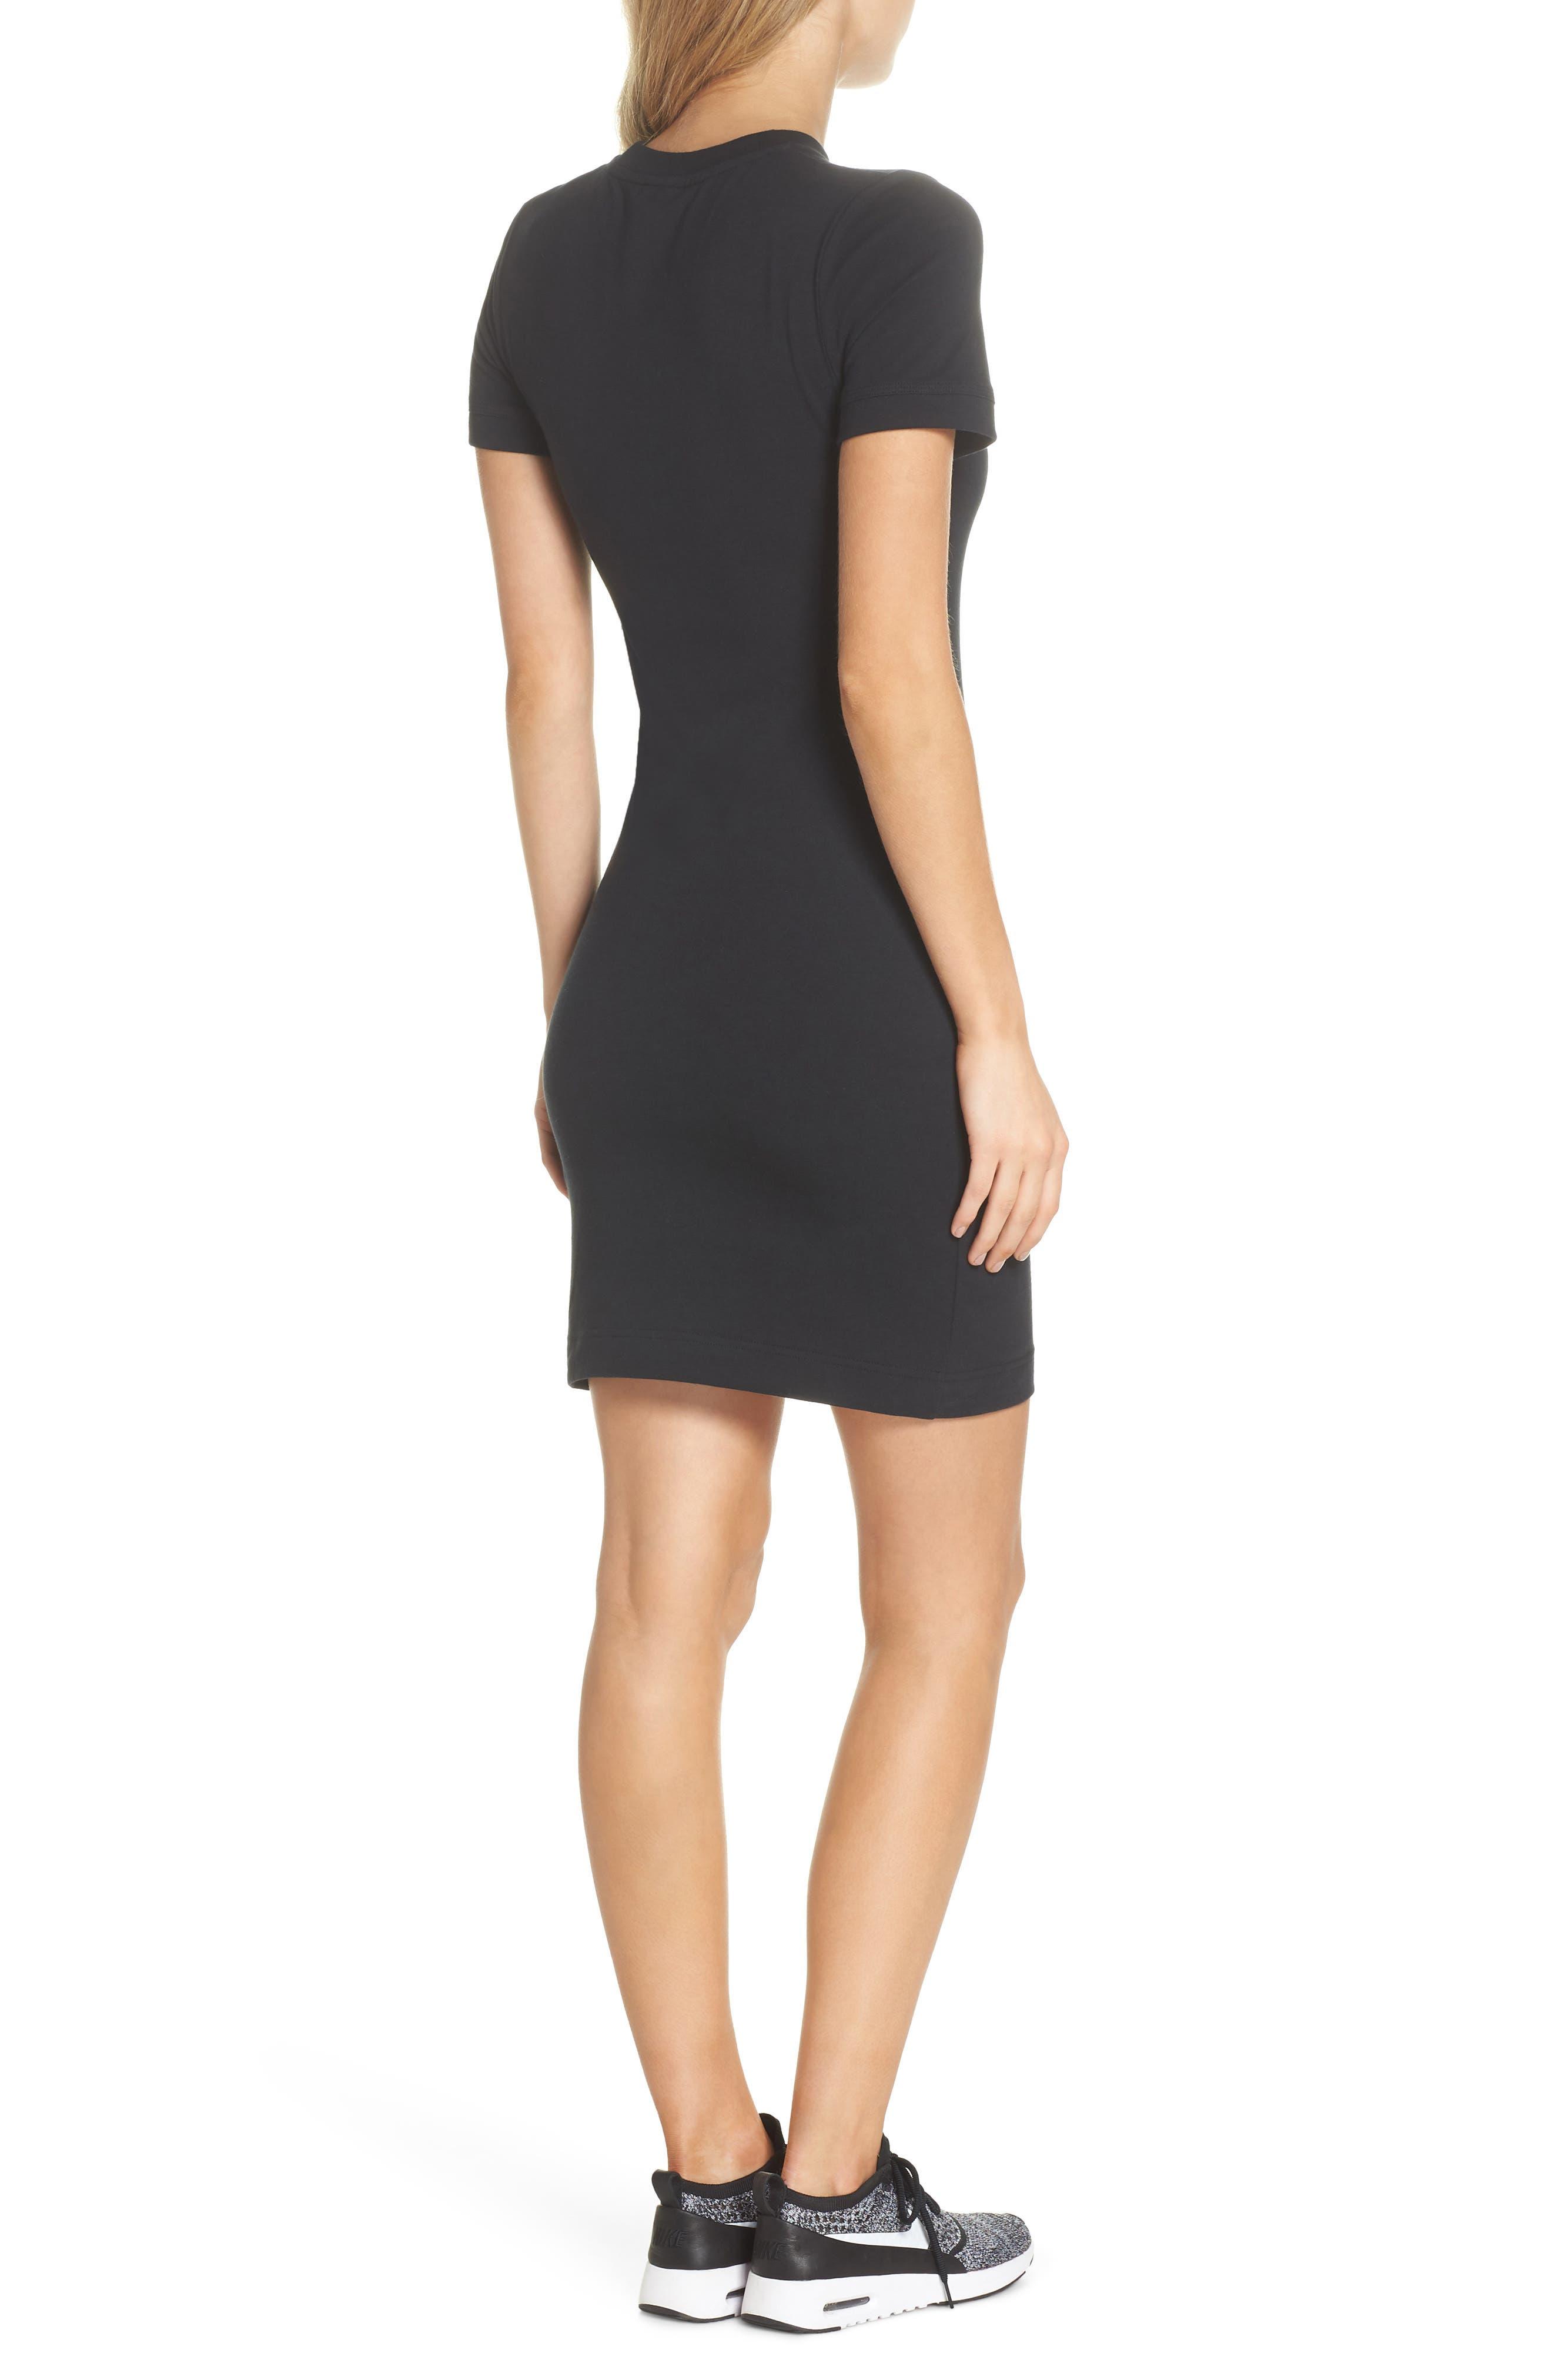 Sportswear T-Shirt Dress,                             Alternate thumbnail 2, color,                             Black/ White